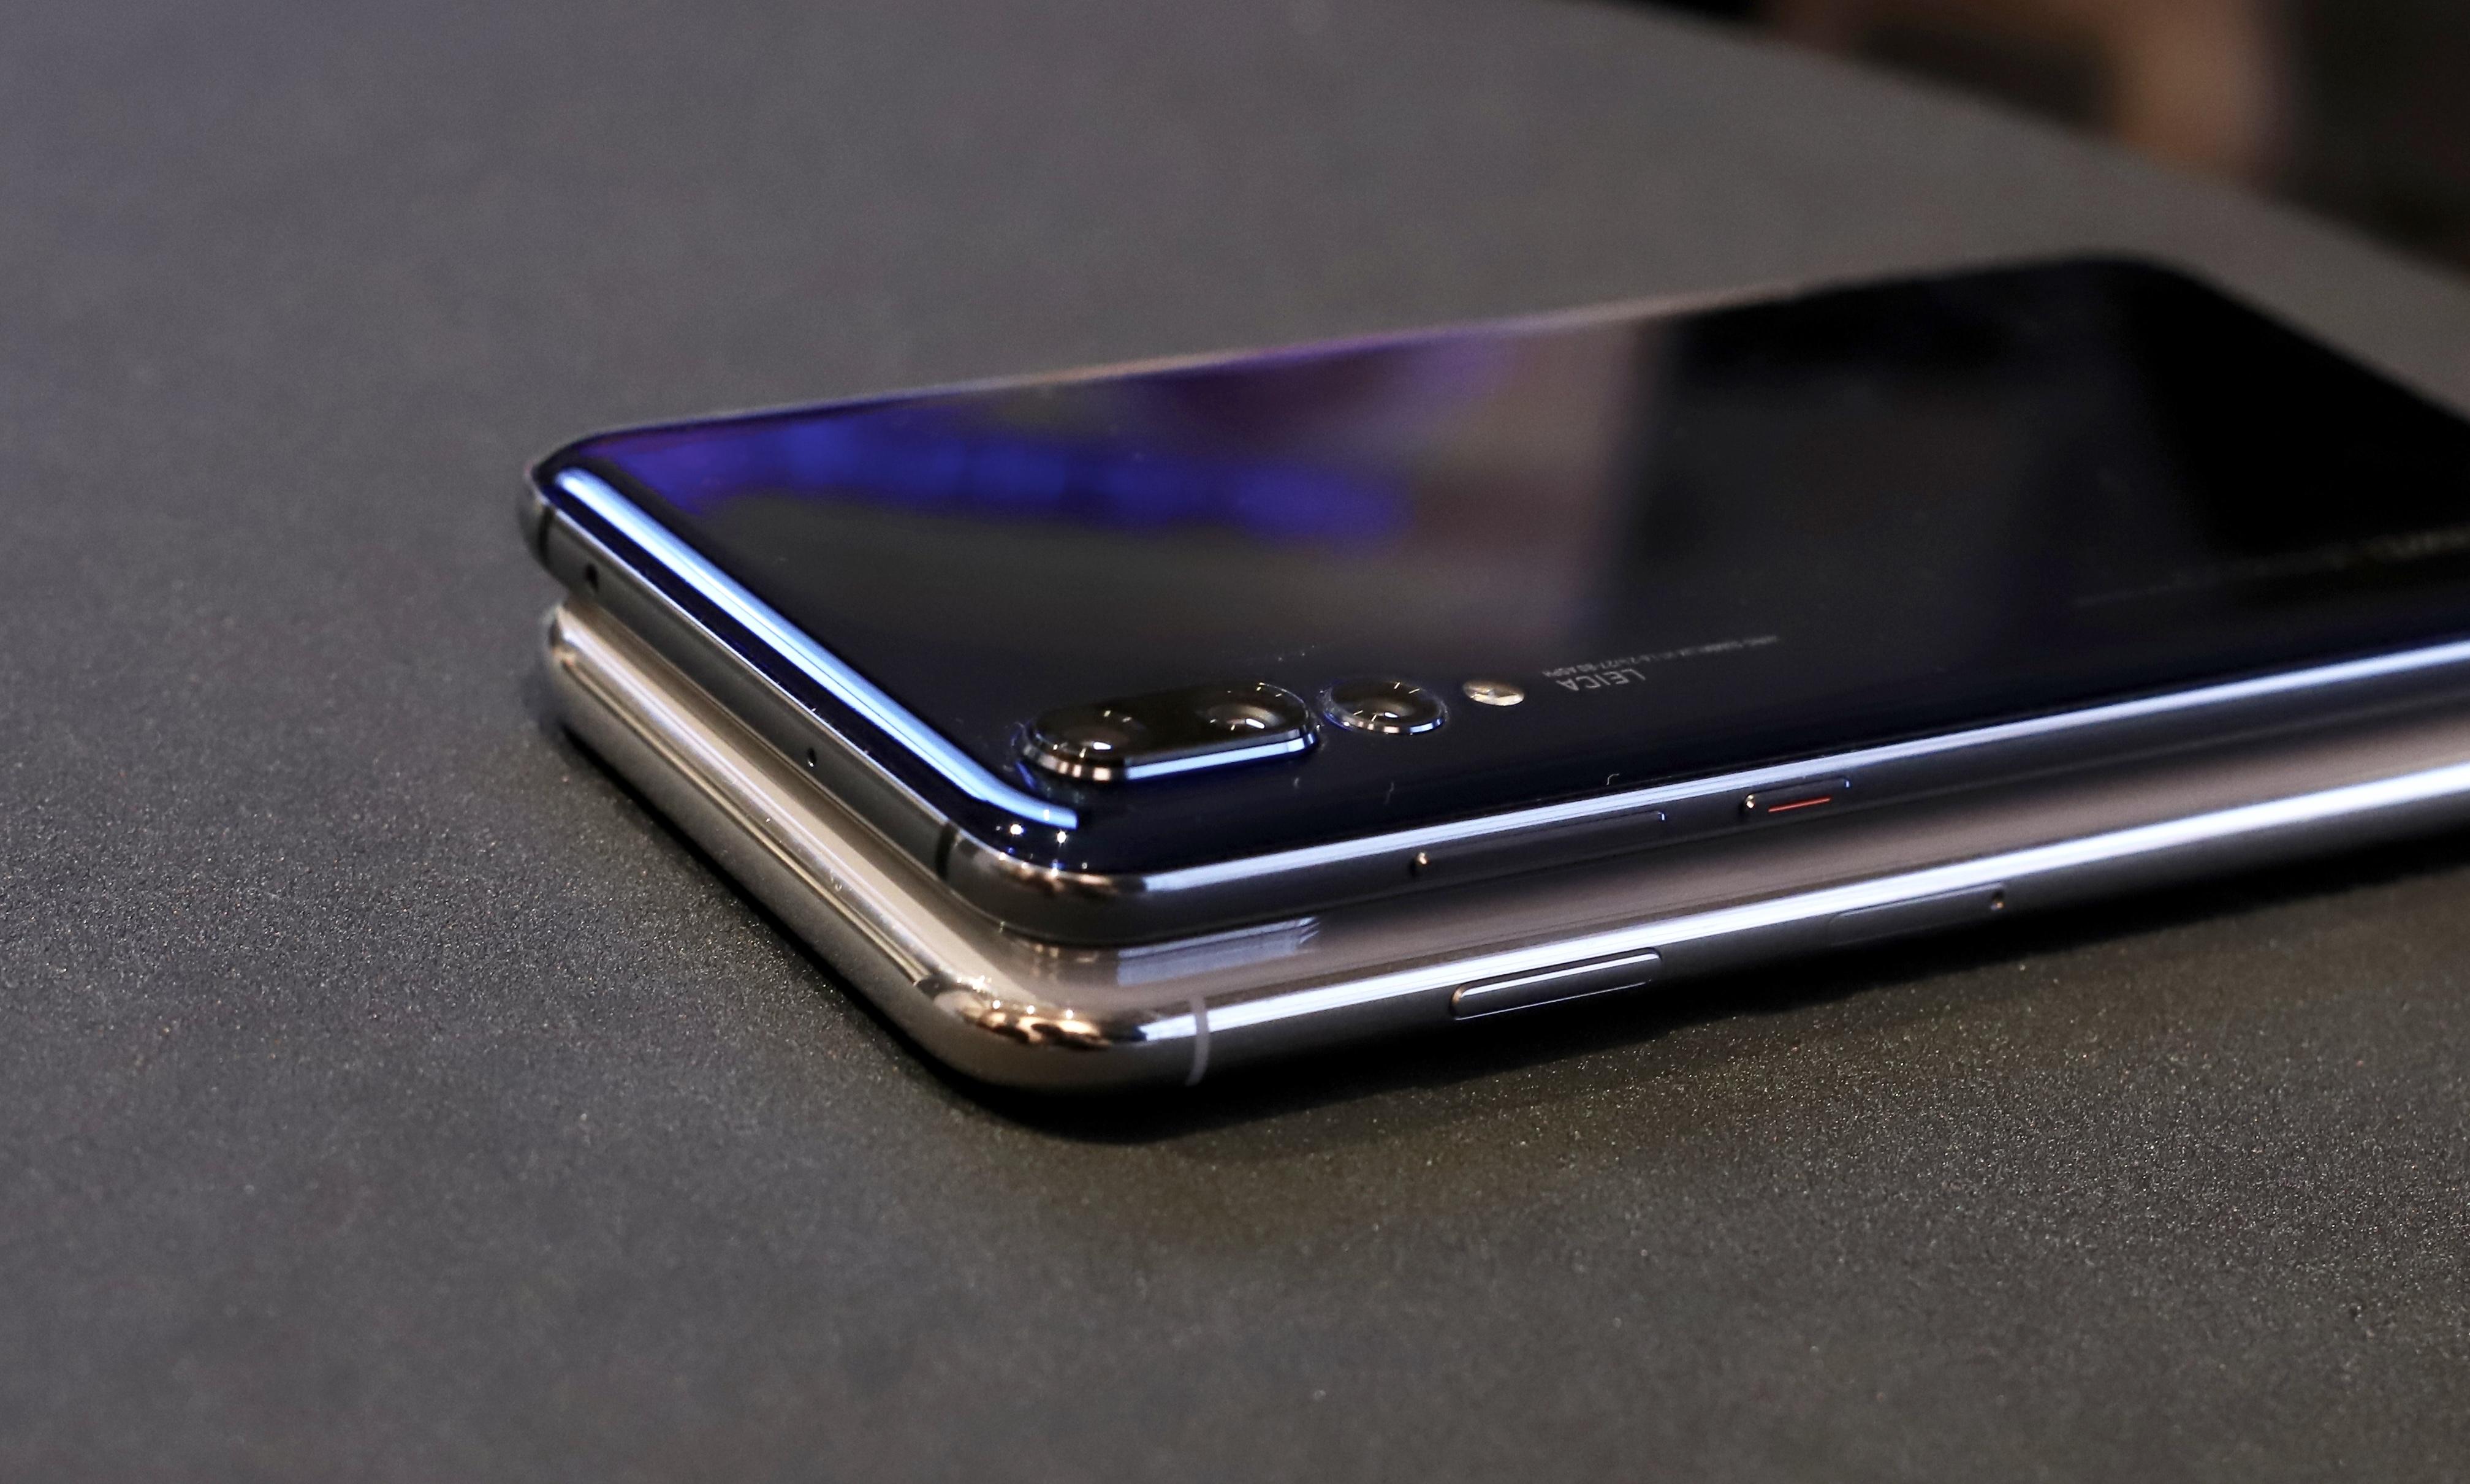 HUAWEI P20 Pro iPhoneX 比較